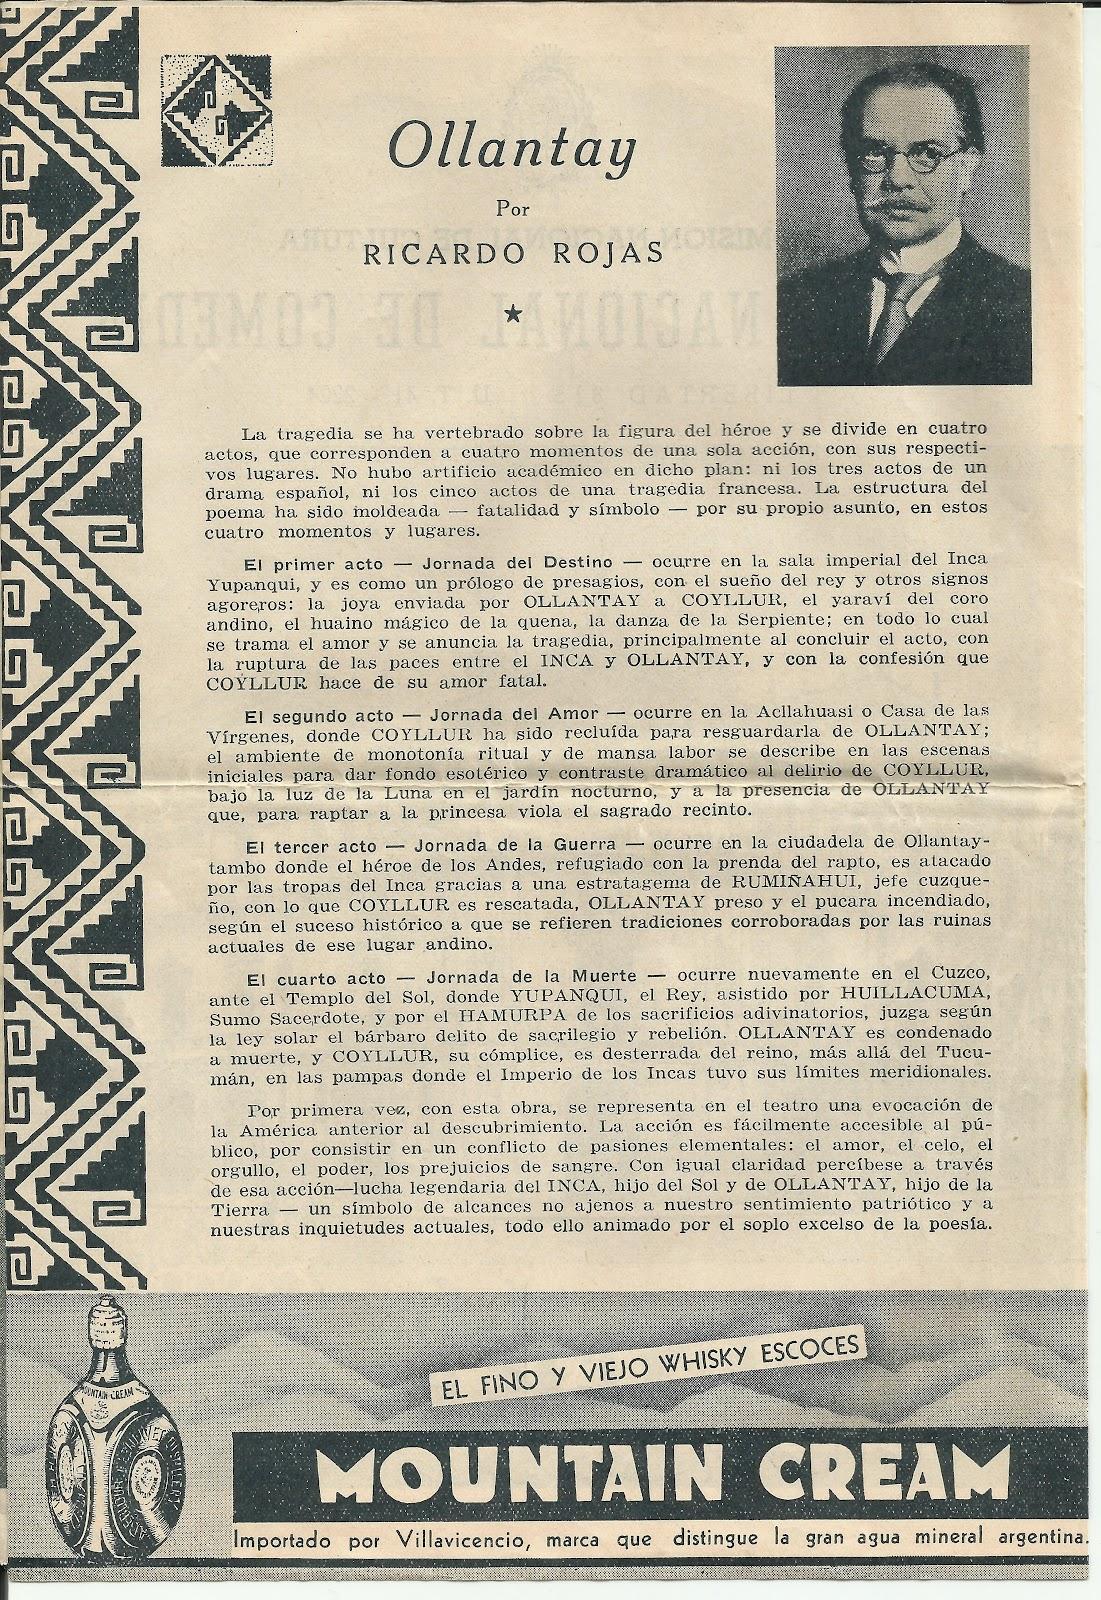 Antonio Cunill Cabanellas Net Worth